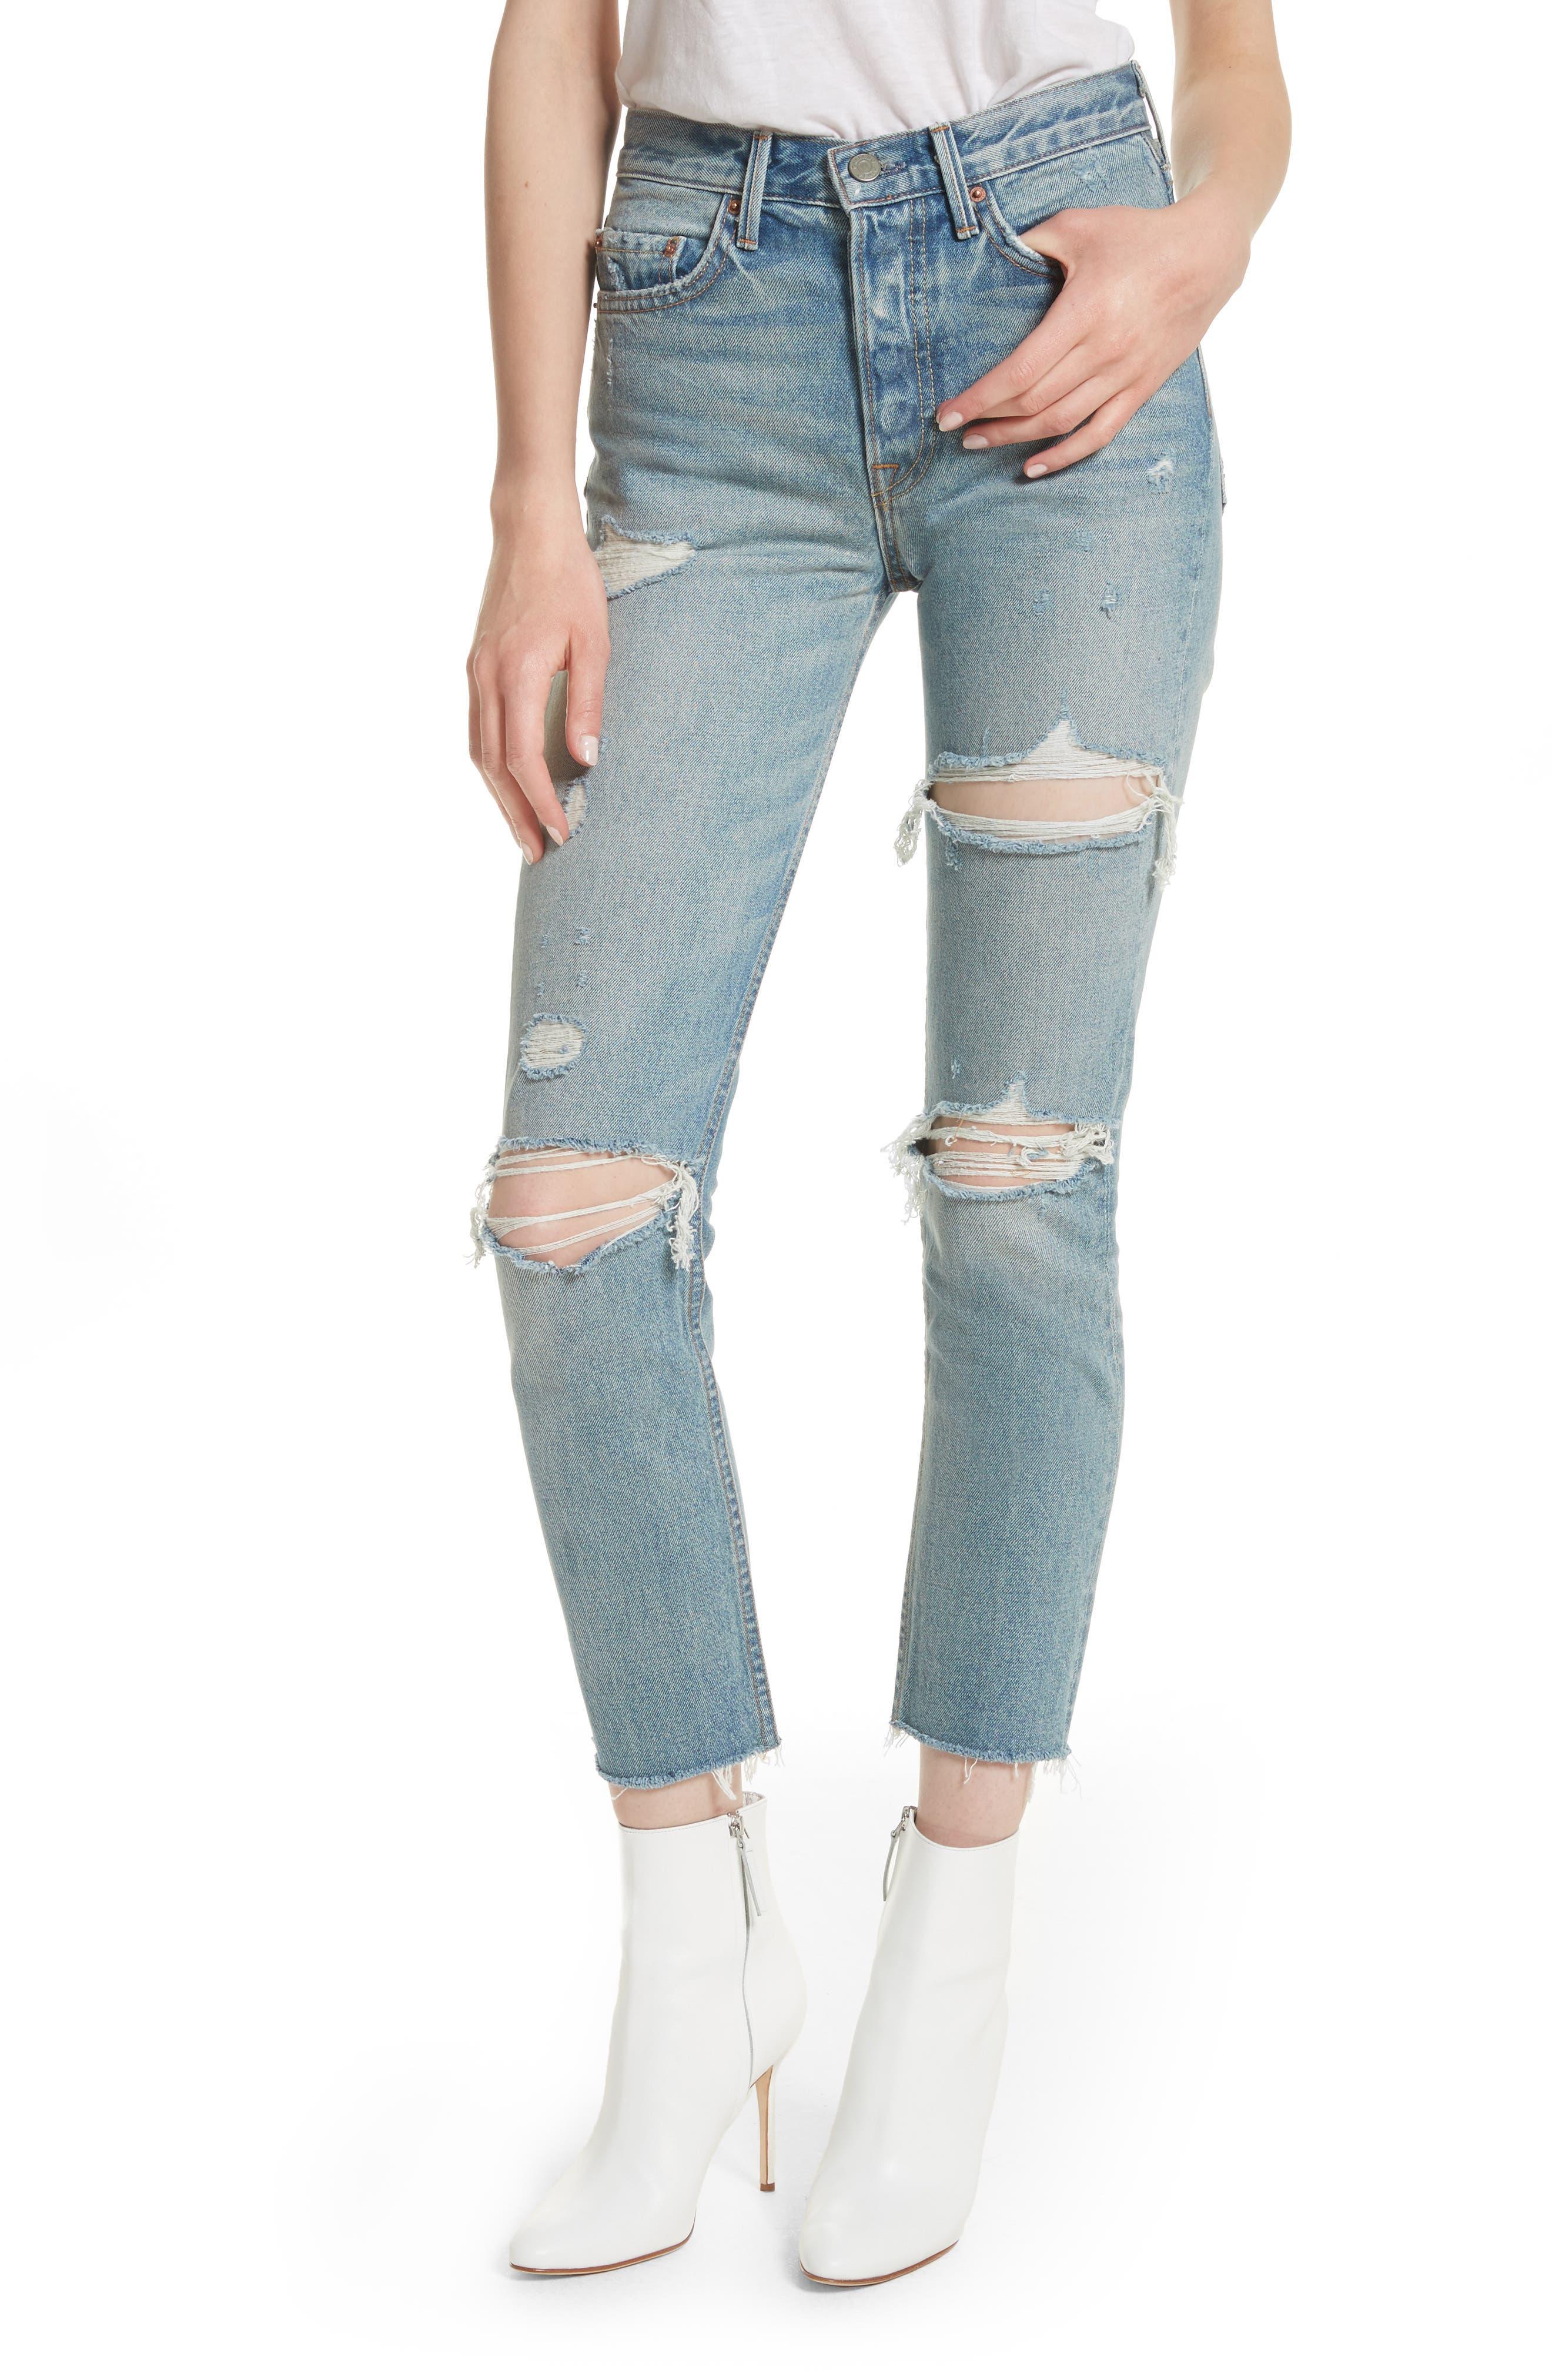 Main Image - GRLFRND Karolina Ripped Rigid High Waist Skinny Jeans (A Little More Love)